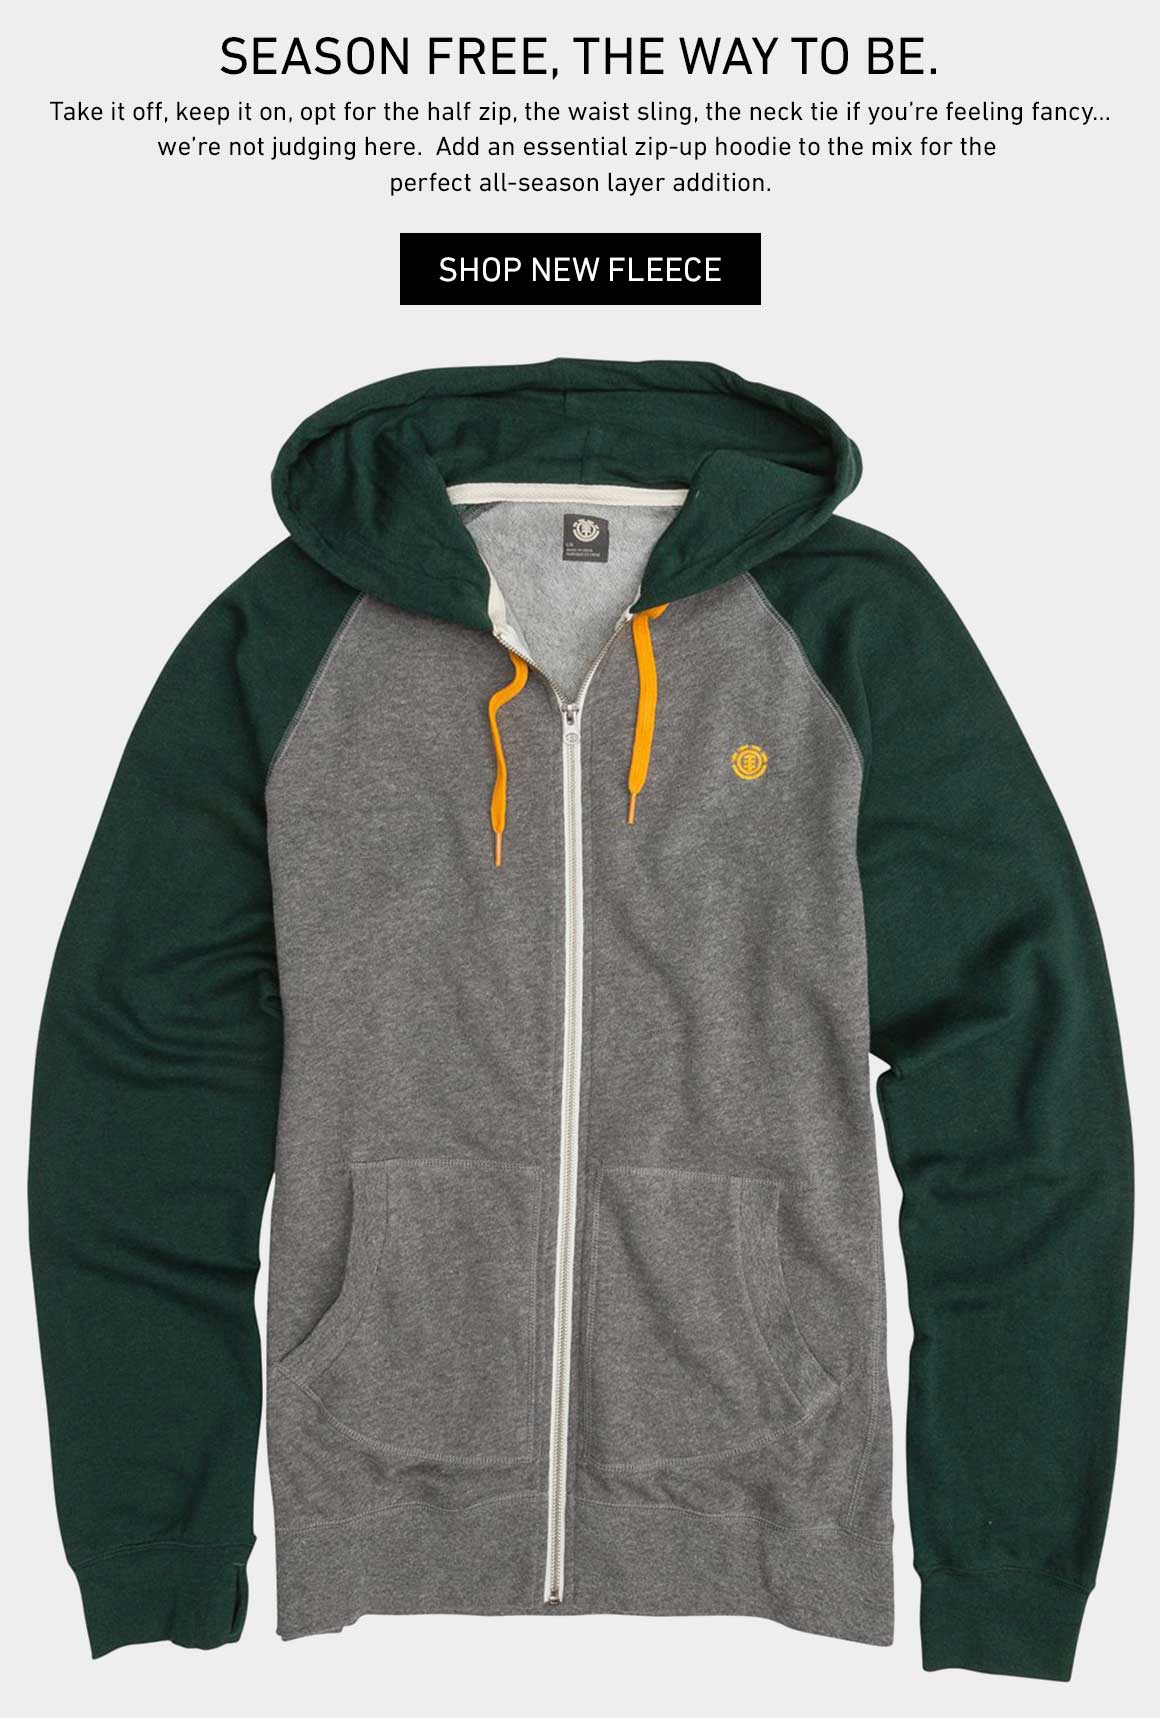 Shop New All-Season Fleece